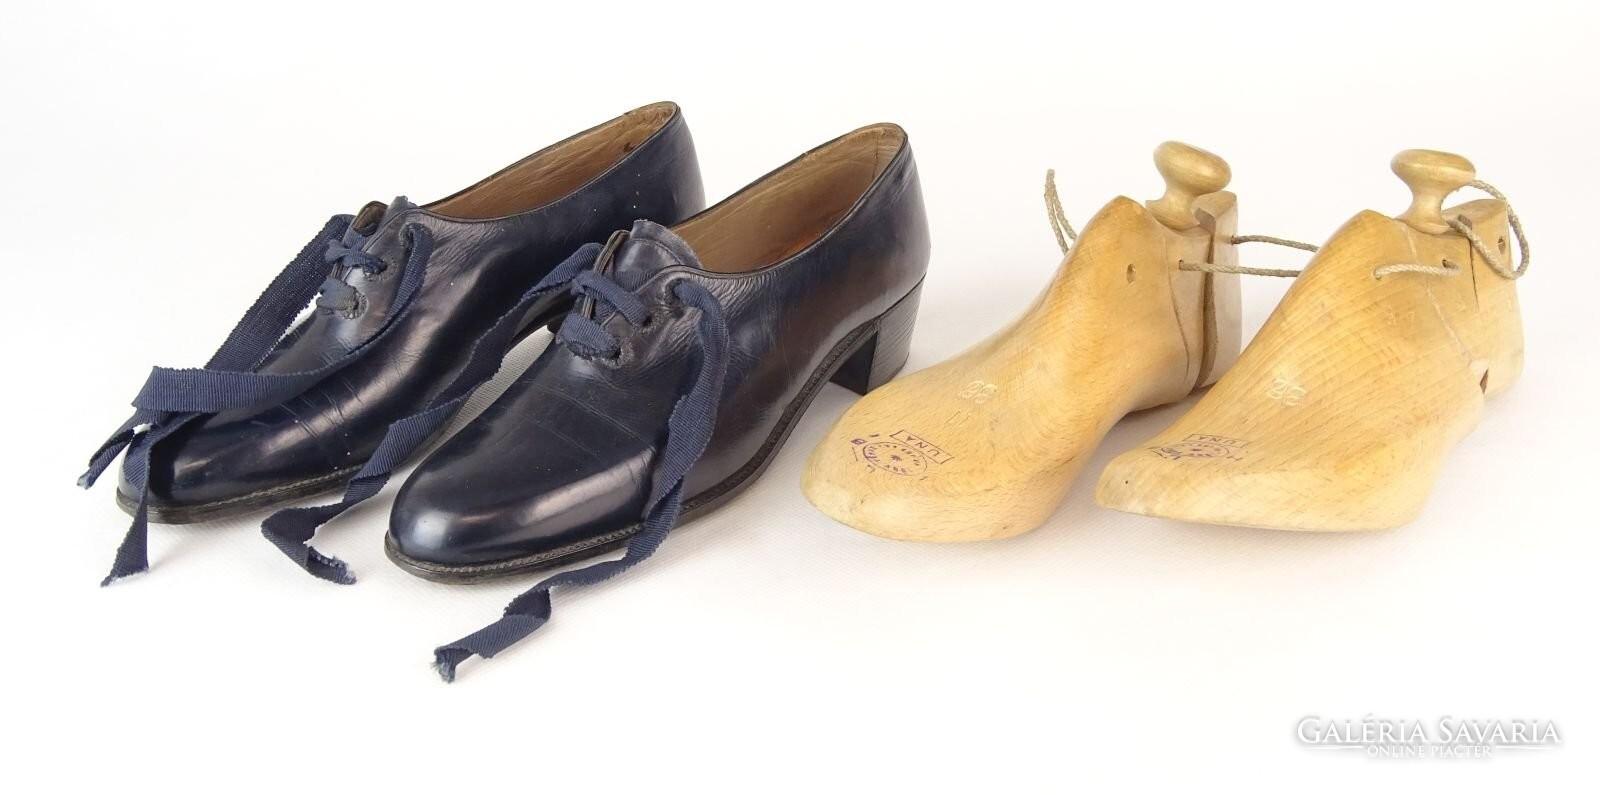 antiques indigókék női Antik 0P609 36 cipő Galeria bőrcipő Other B0xa5x 134ca8d5f9